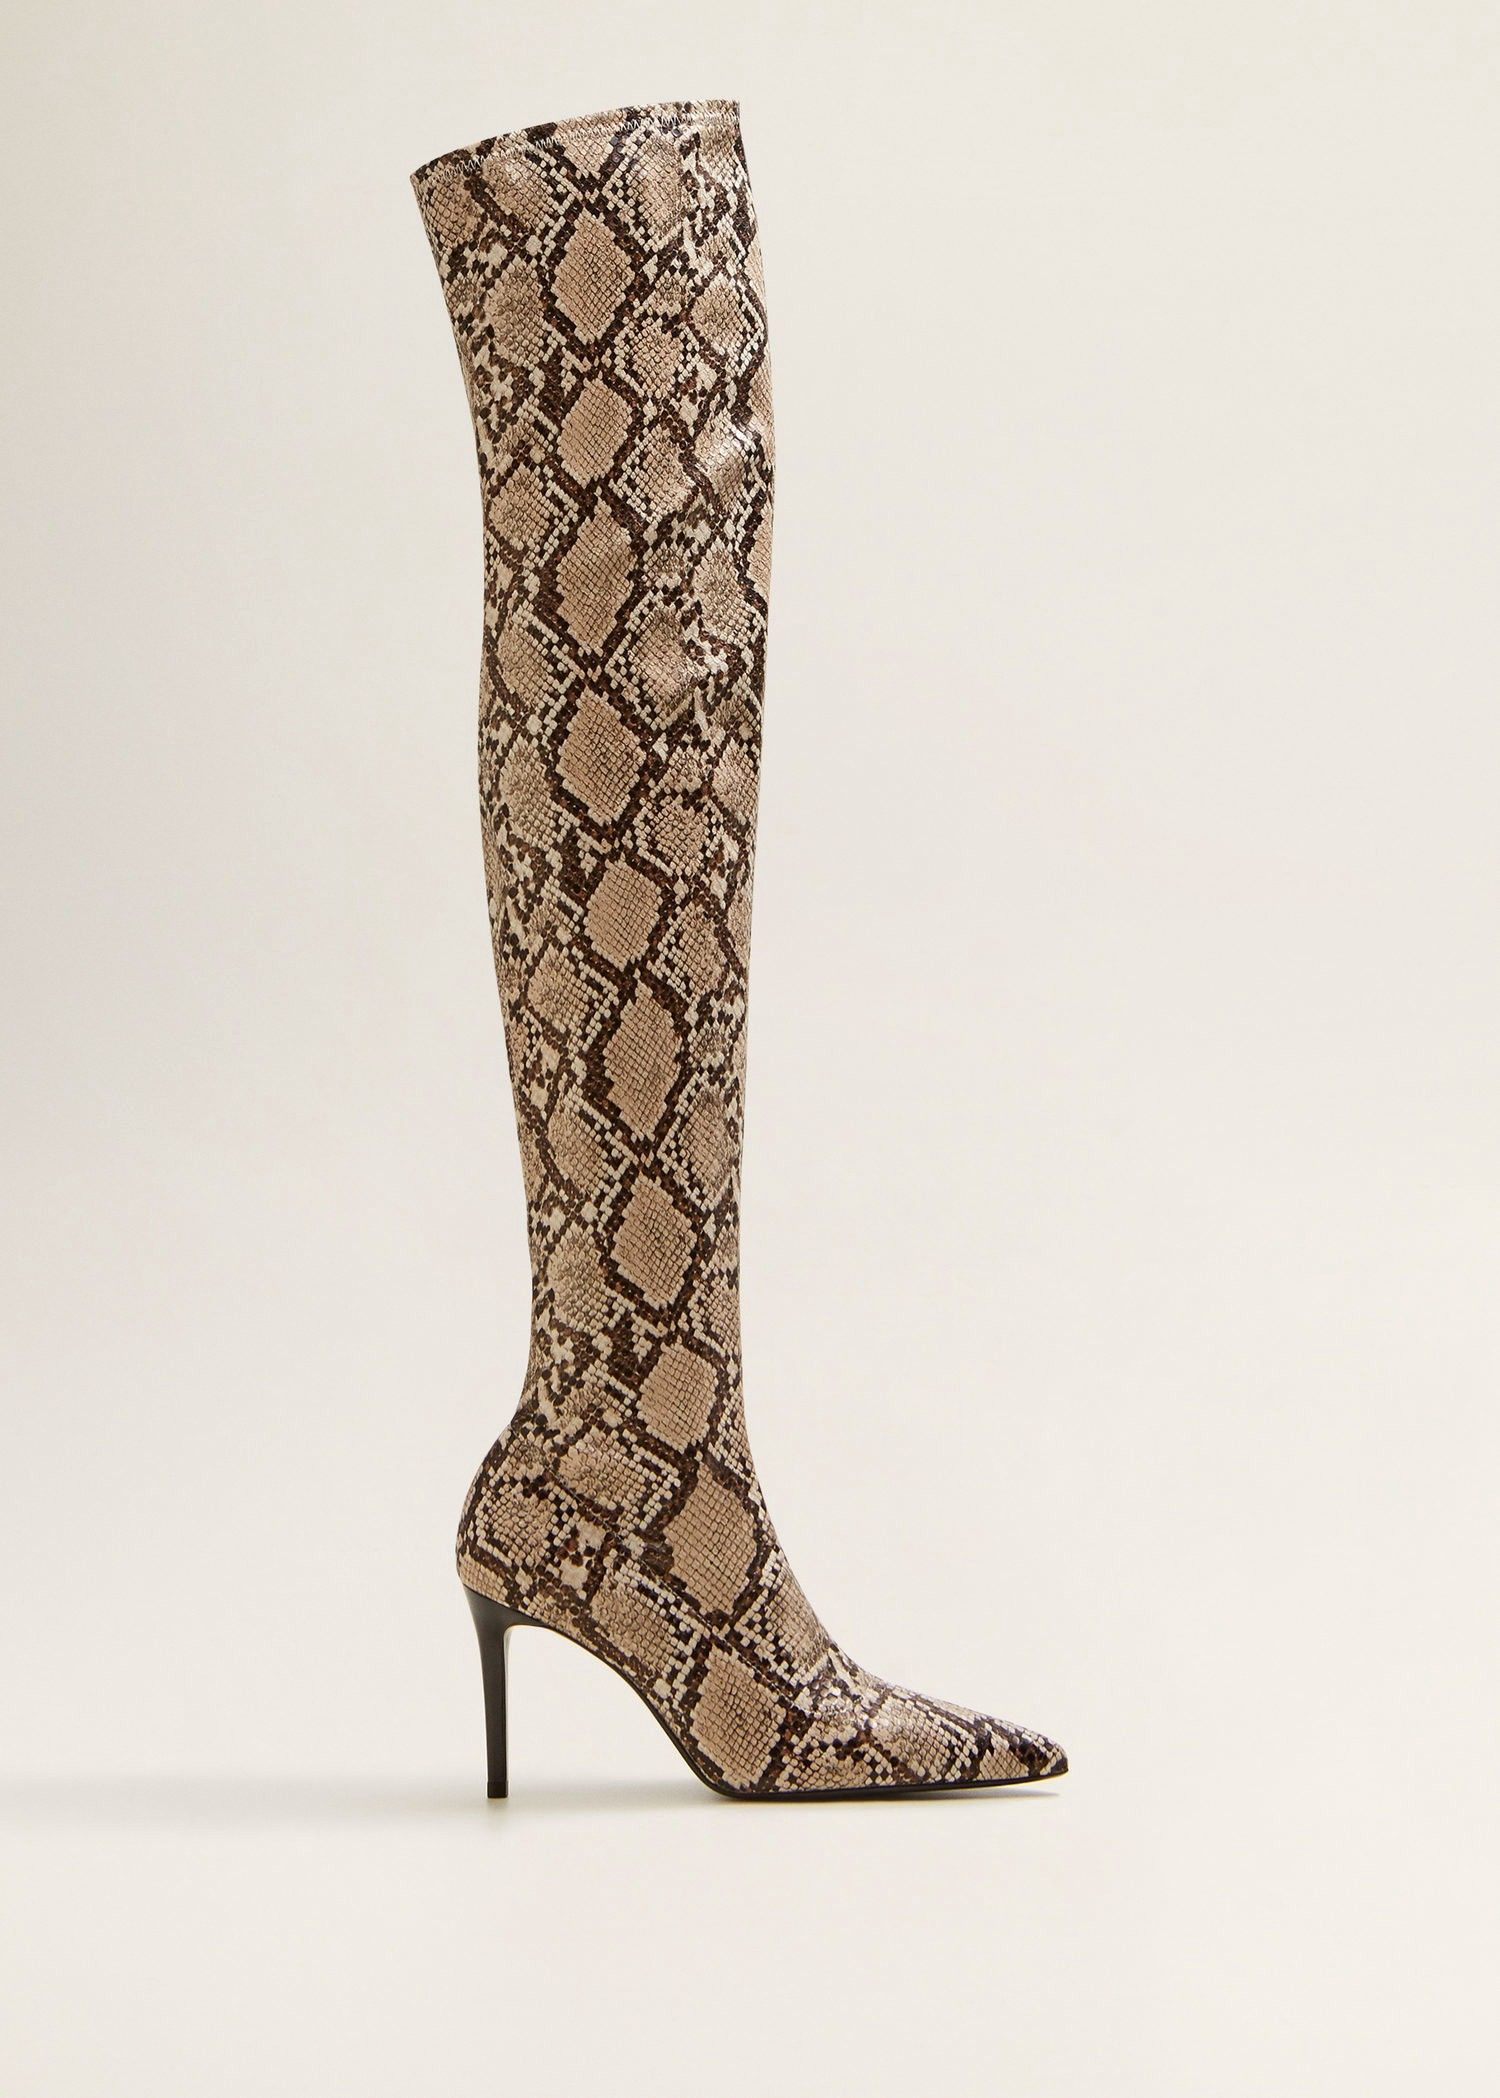 c87033801010e Snake effect high-leg boots by Mango   Products   Boots, High leg ...